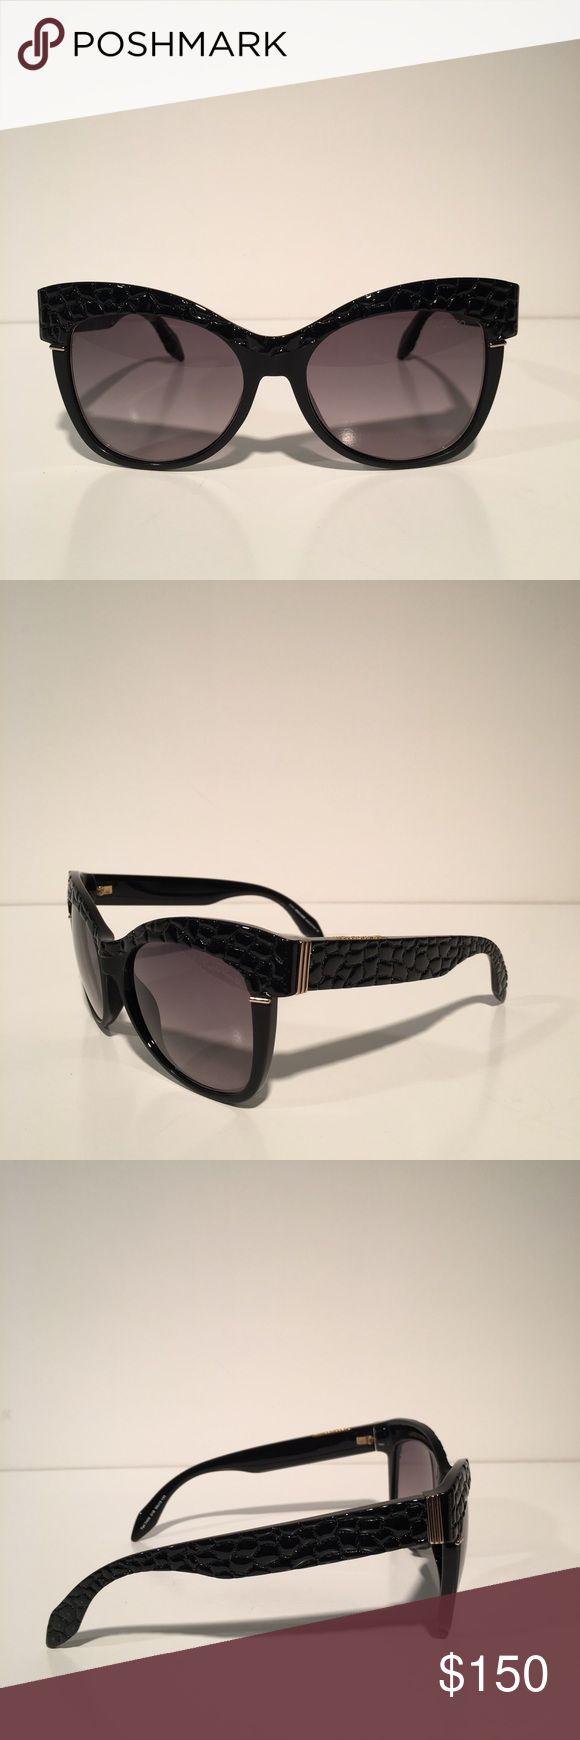 Roberto Cavalli Black Wayfarer Sunglasses Brand new with box and cloth. Made in Italy. Roberto Cavalli Accessories Sunglasses